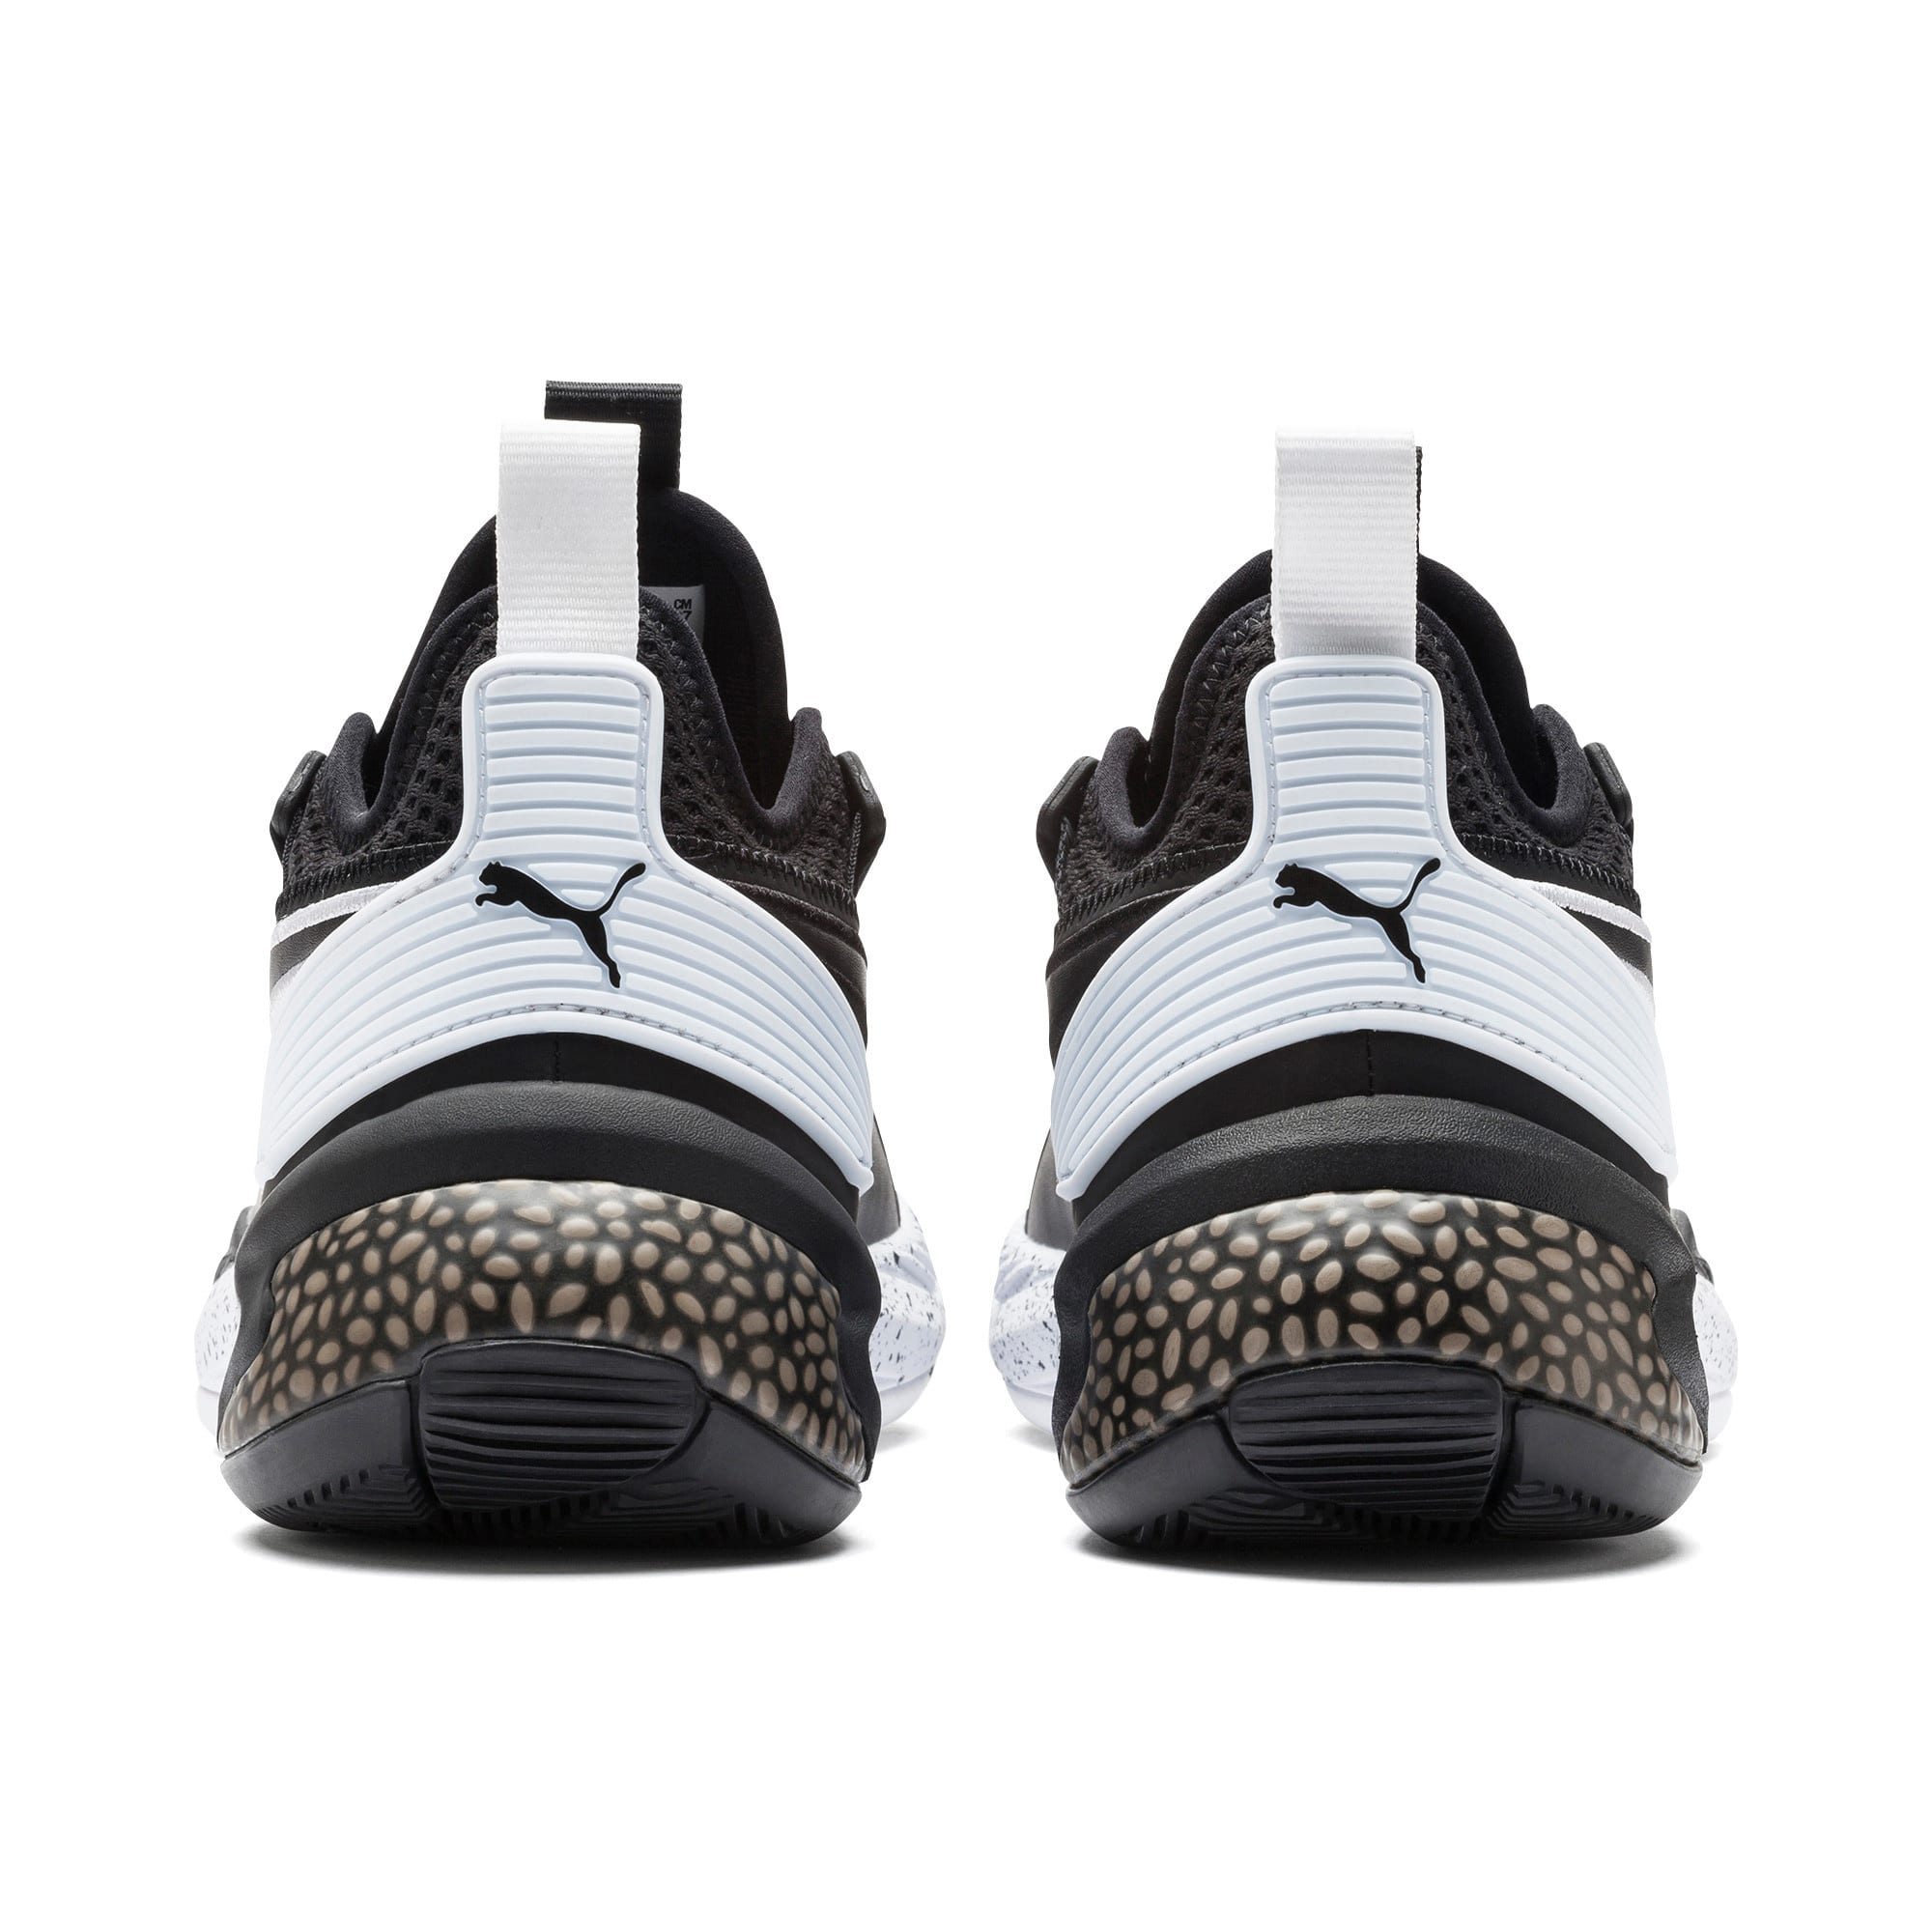 Thumbnail 3 of Uproar Core Basketball Shoes, Puma Black, medium